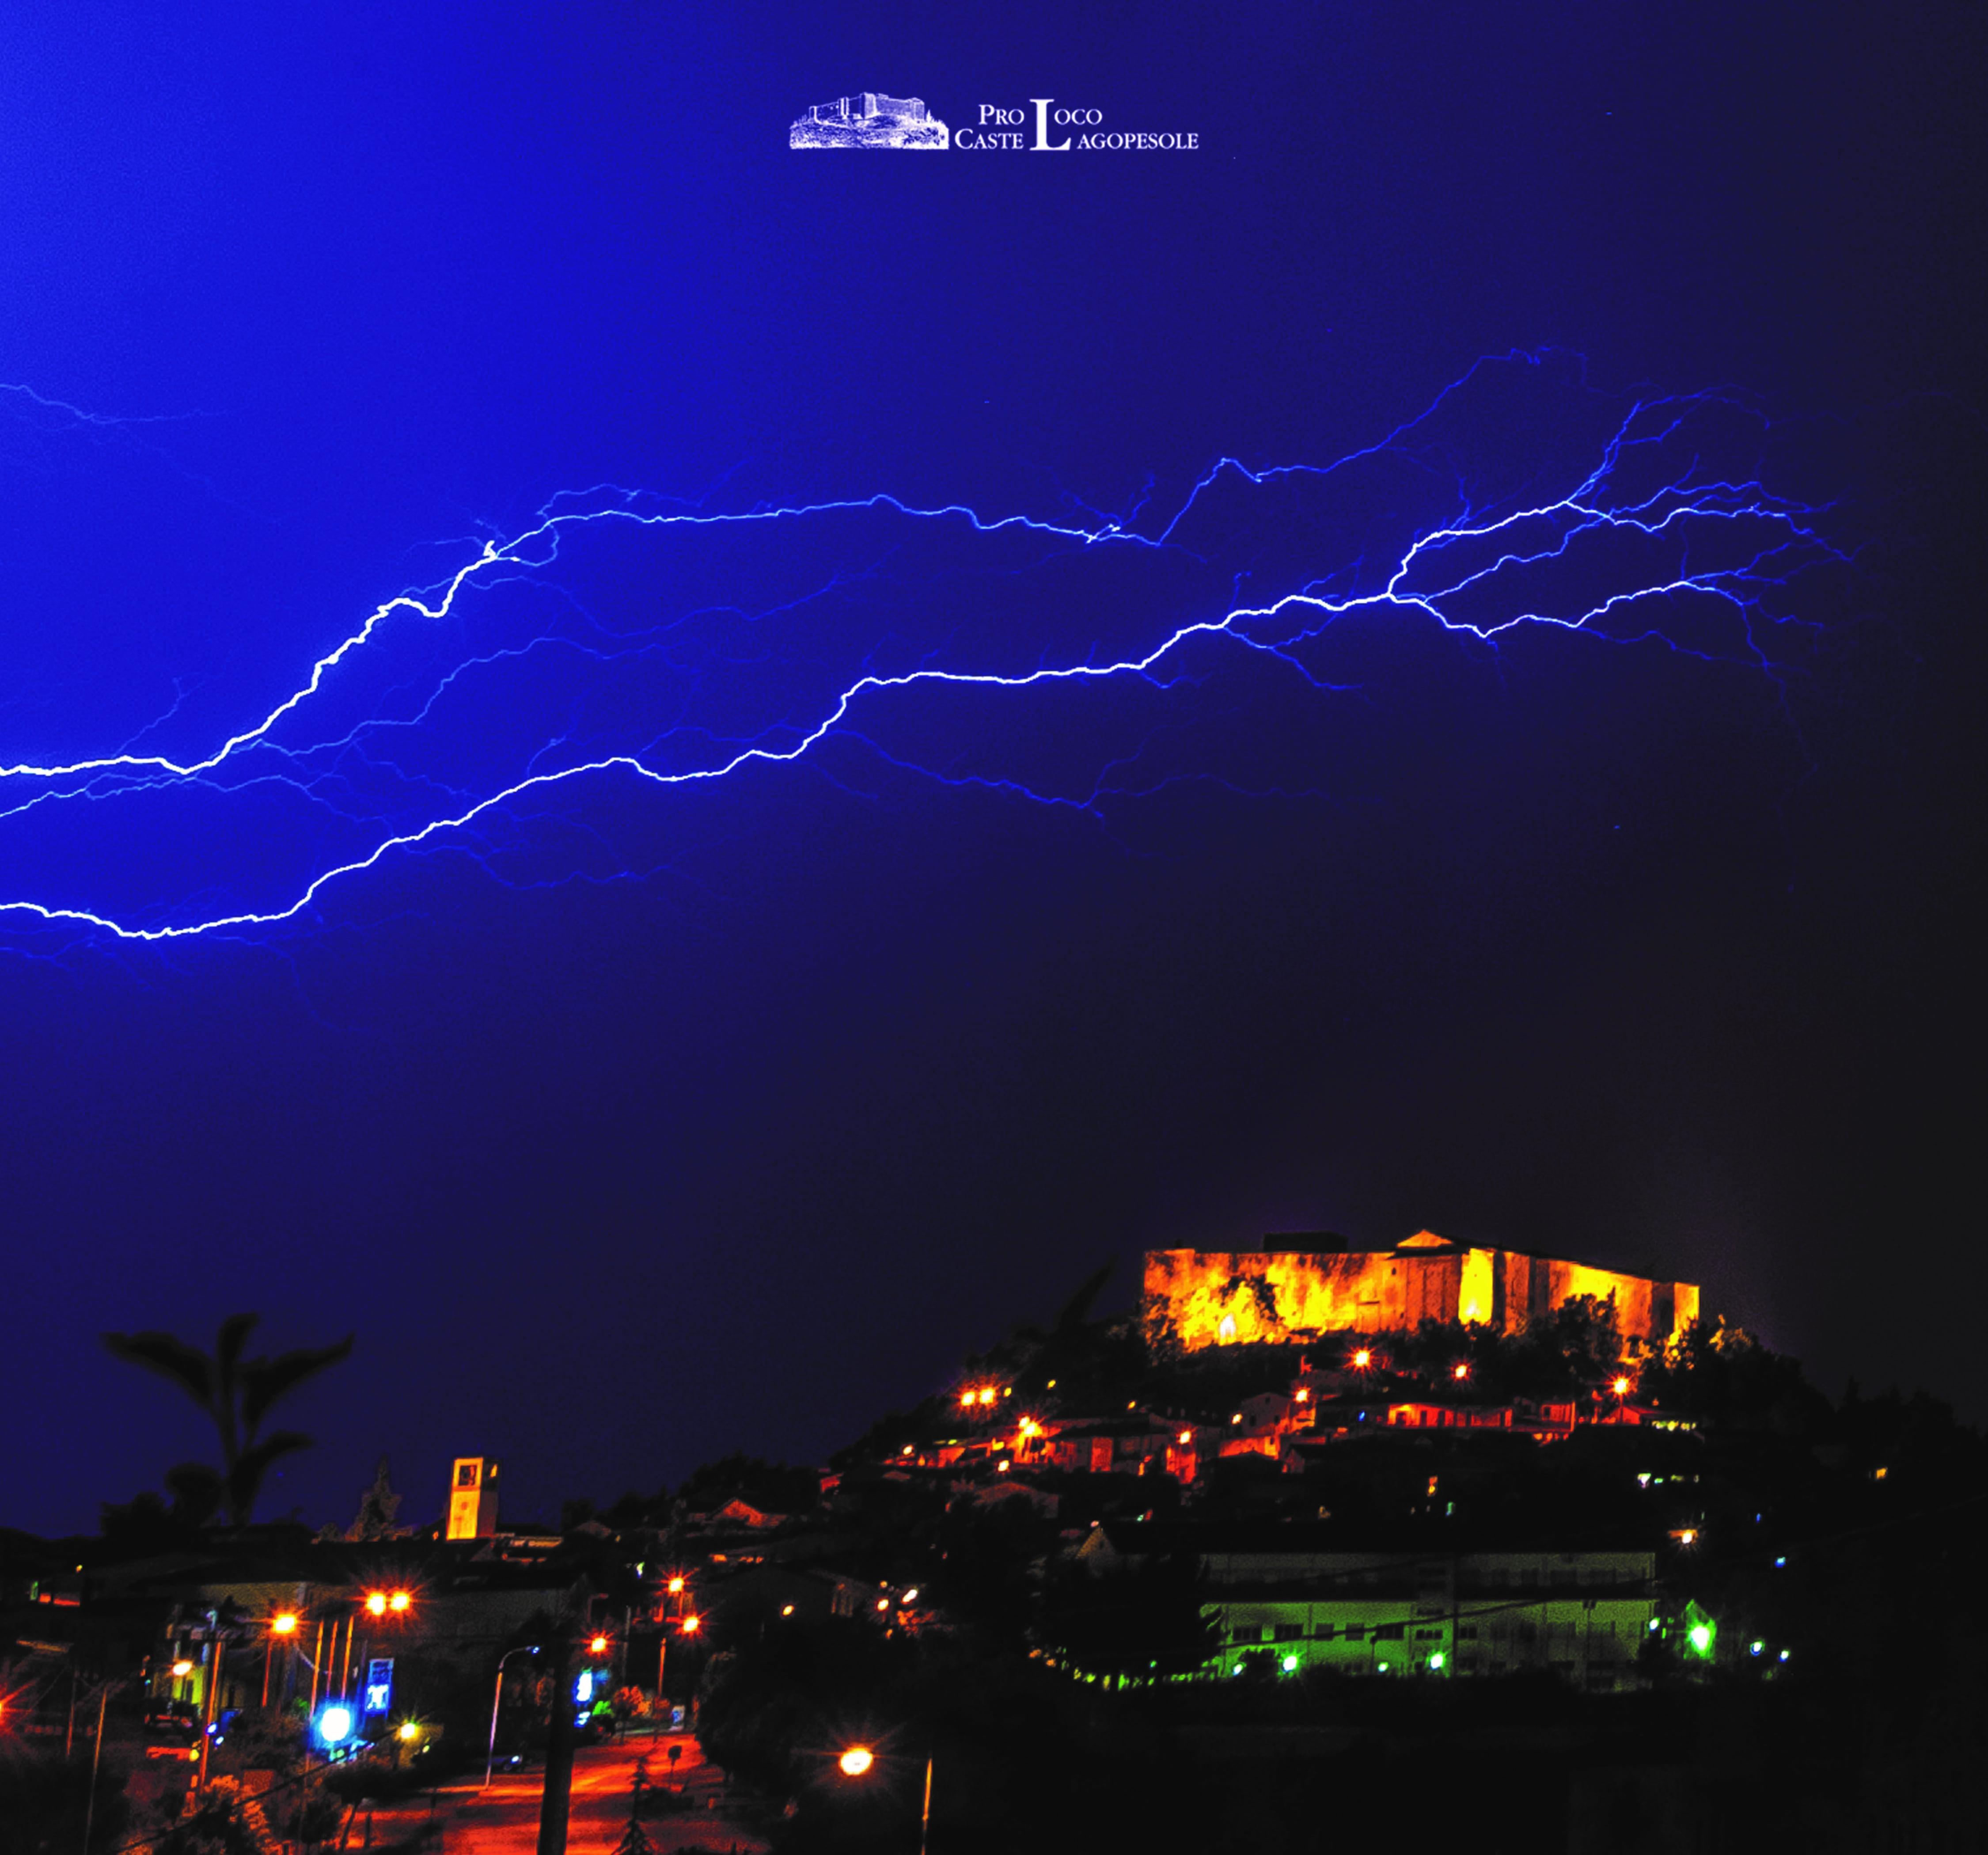 castello+fulmine